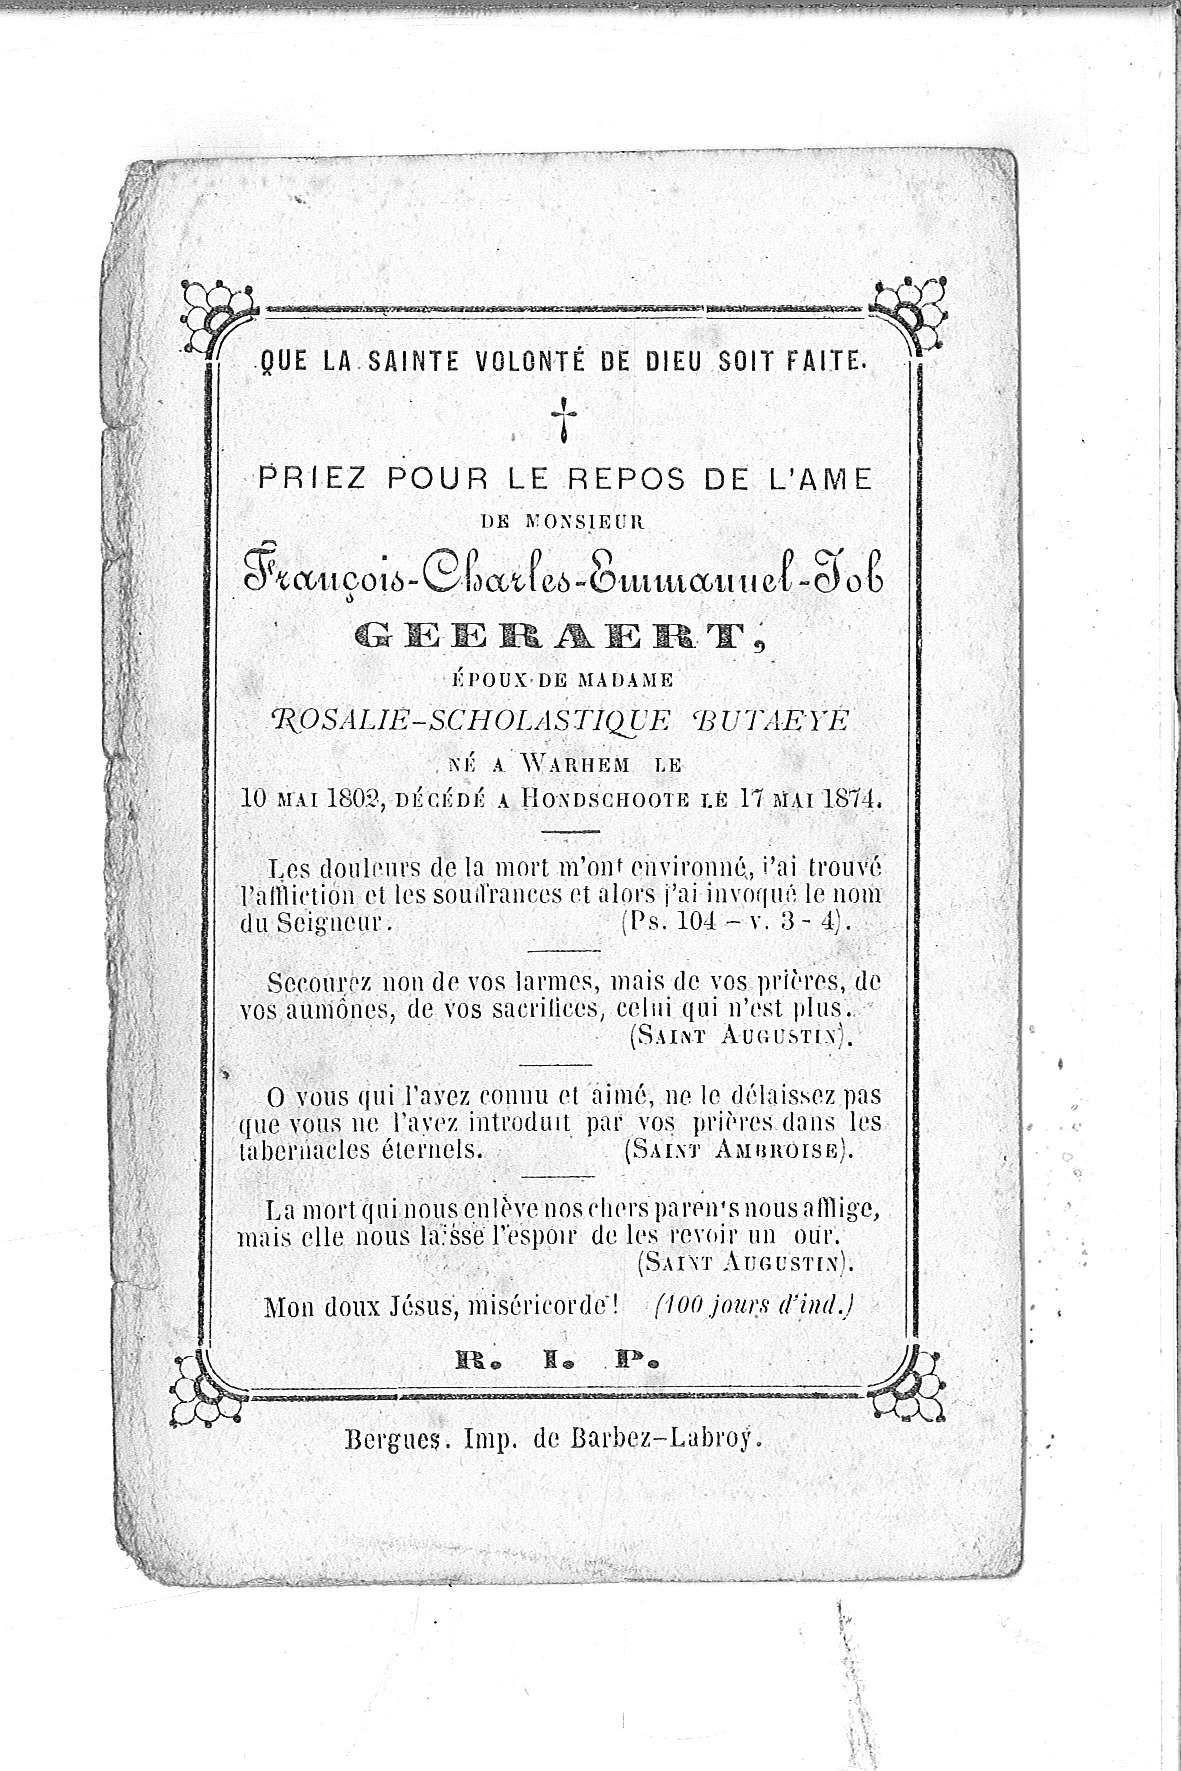 Francois-Charles-Emmanuel-Job(1874)20130820085803_00016.jpg